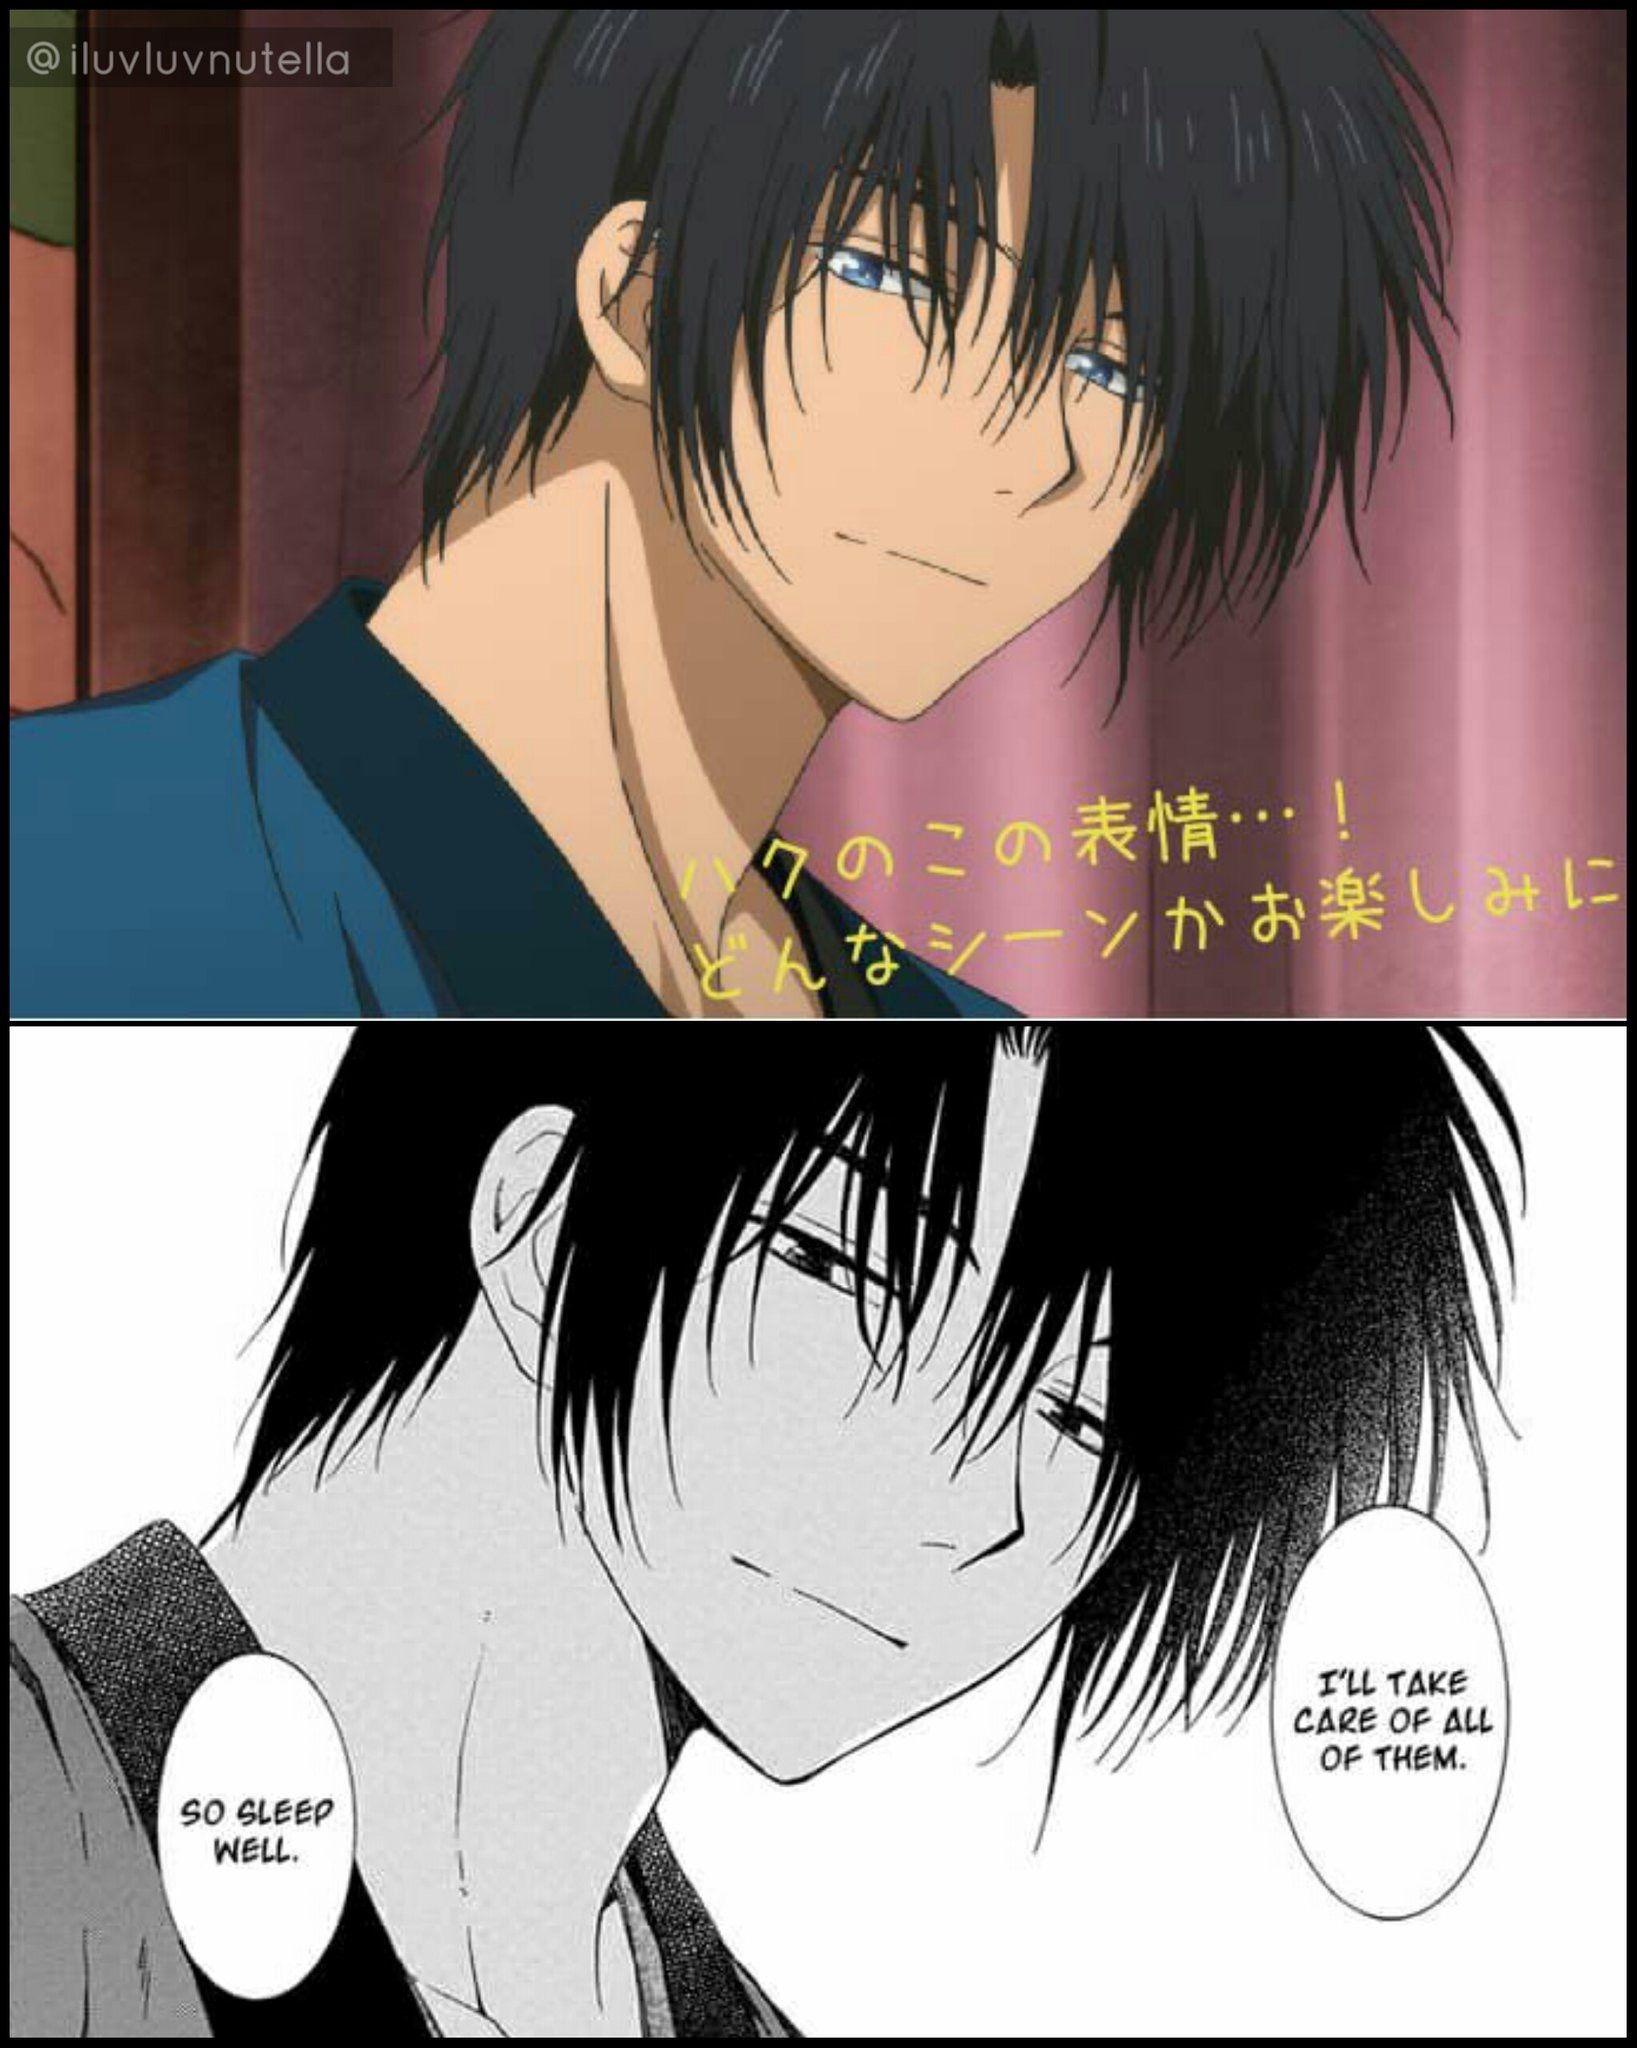 Akatsuki No Yona Ova 3 333 Hak Is So Aghhh Beautiful T T Anime